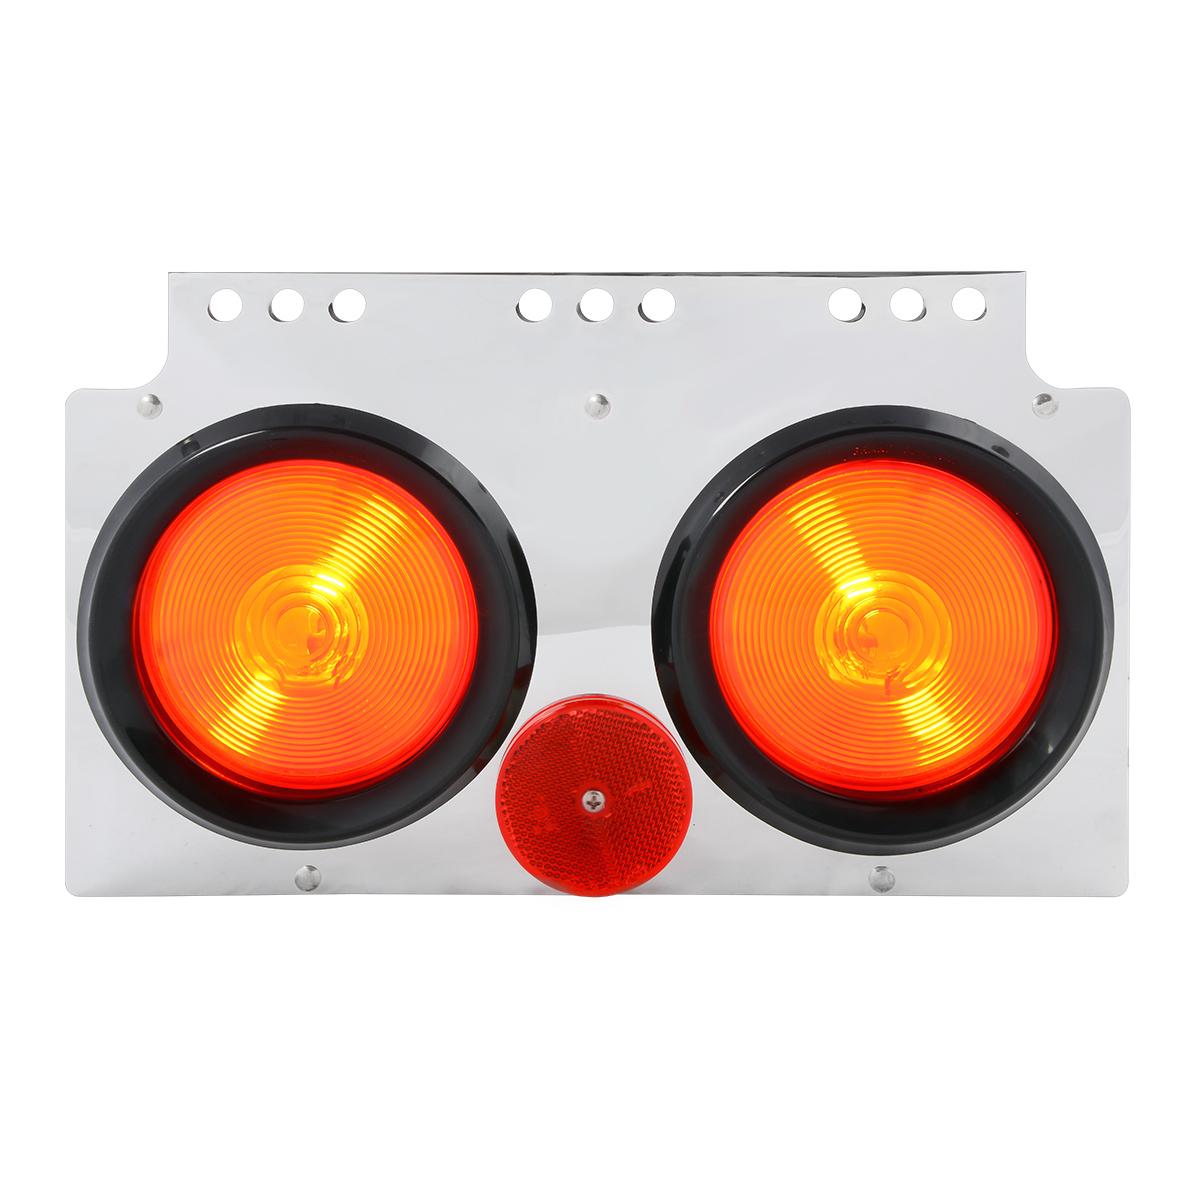 #84920 Regular Incandescent Chrome Steel Module Light Box